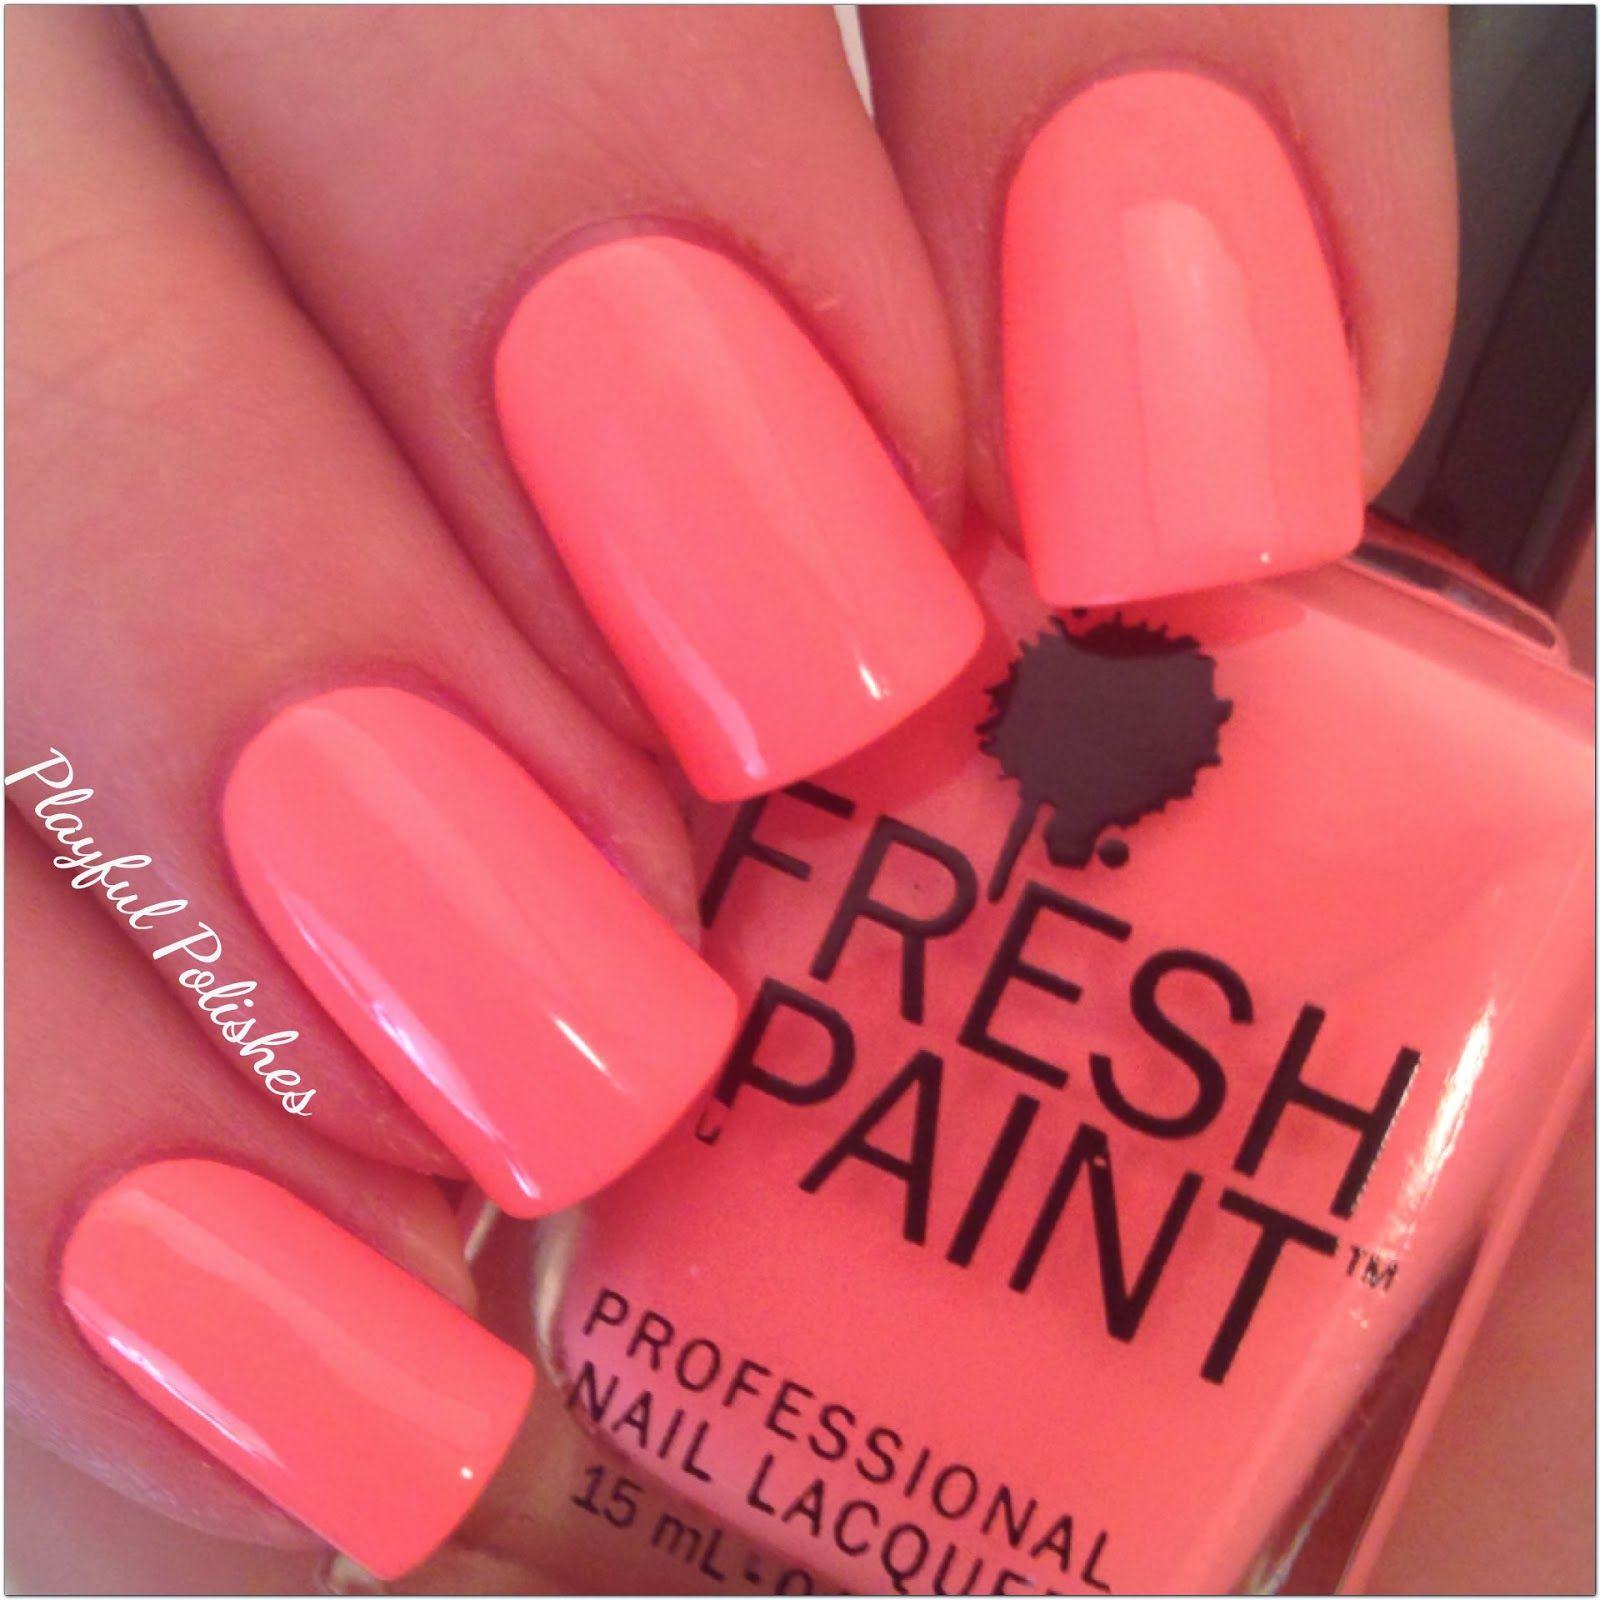 Fresh Paint - Guava   Nail Polish Colors I Already Own   Pinterest ...